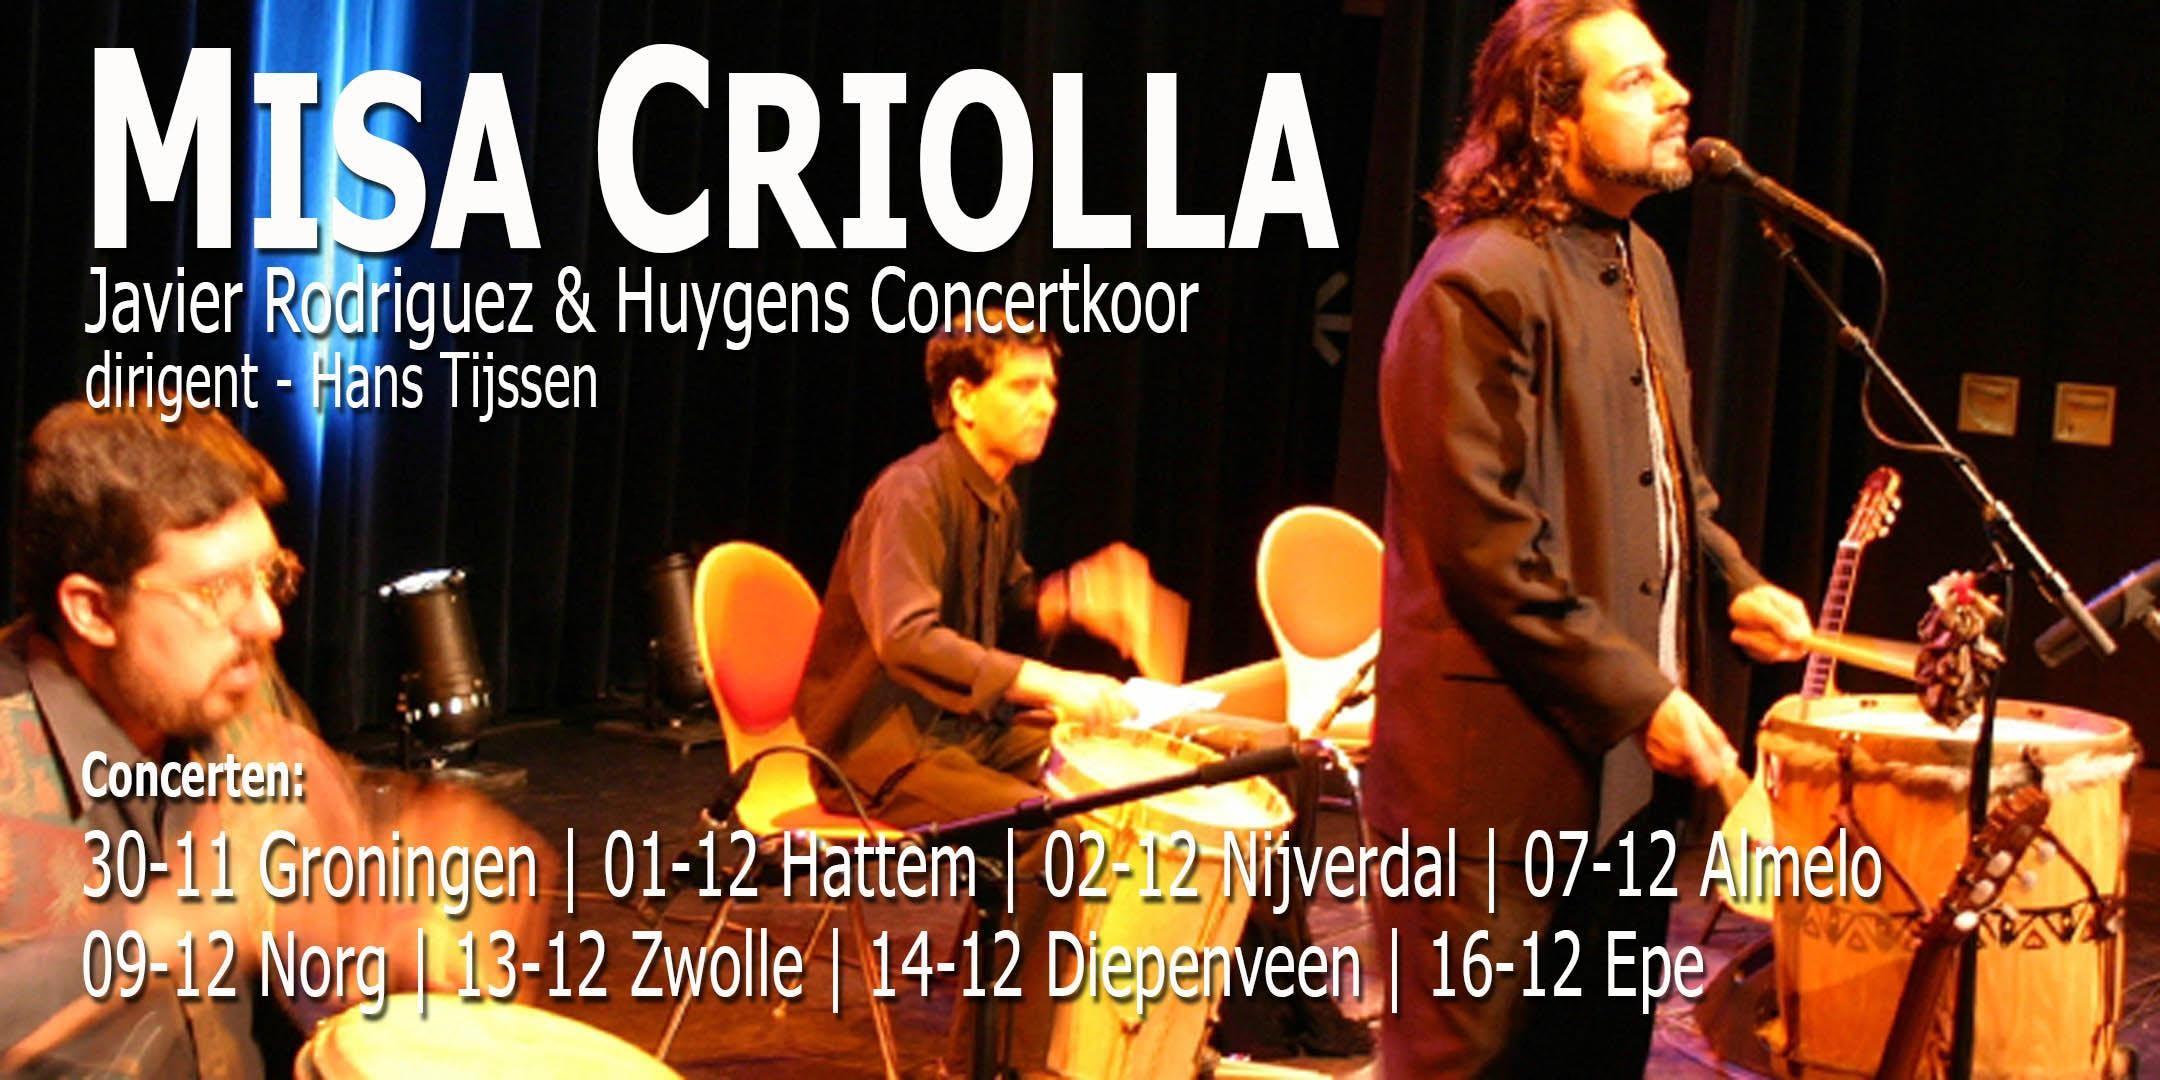 Musica Celestial - Misa Criolla